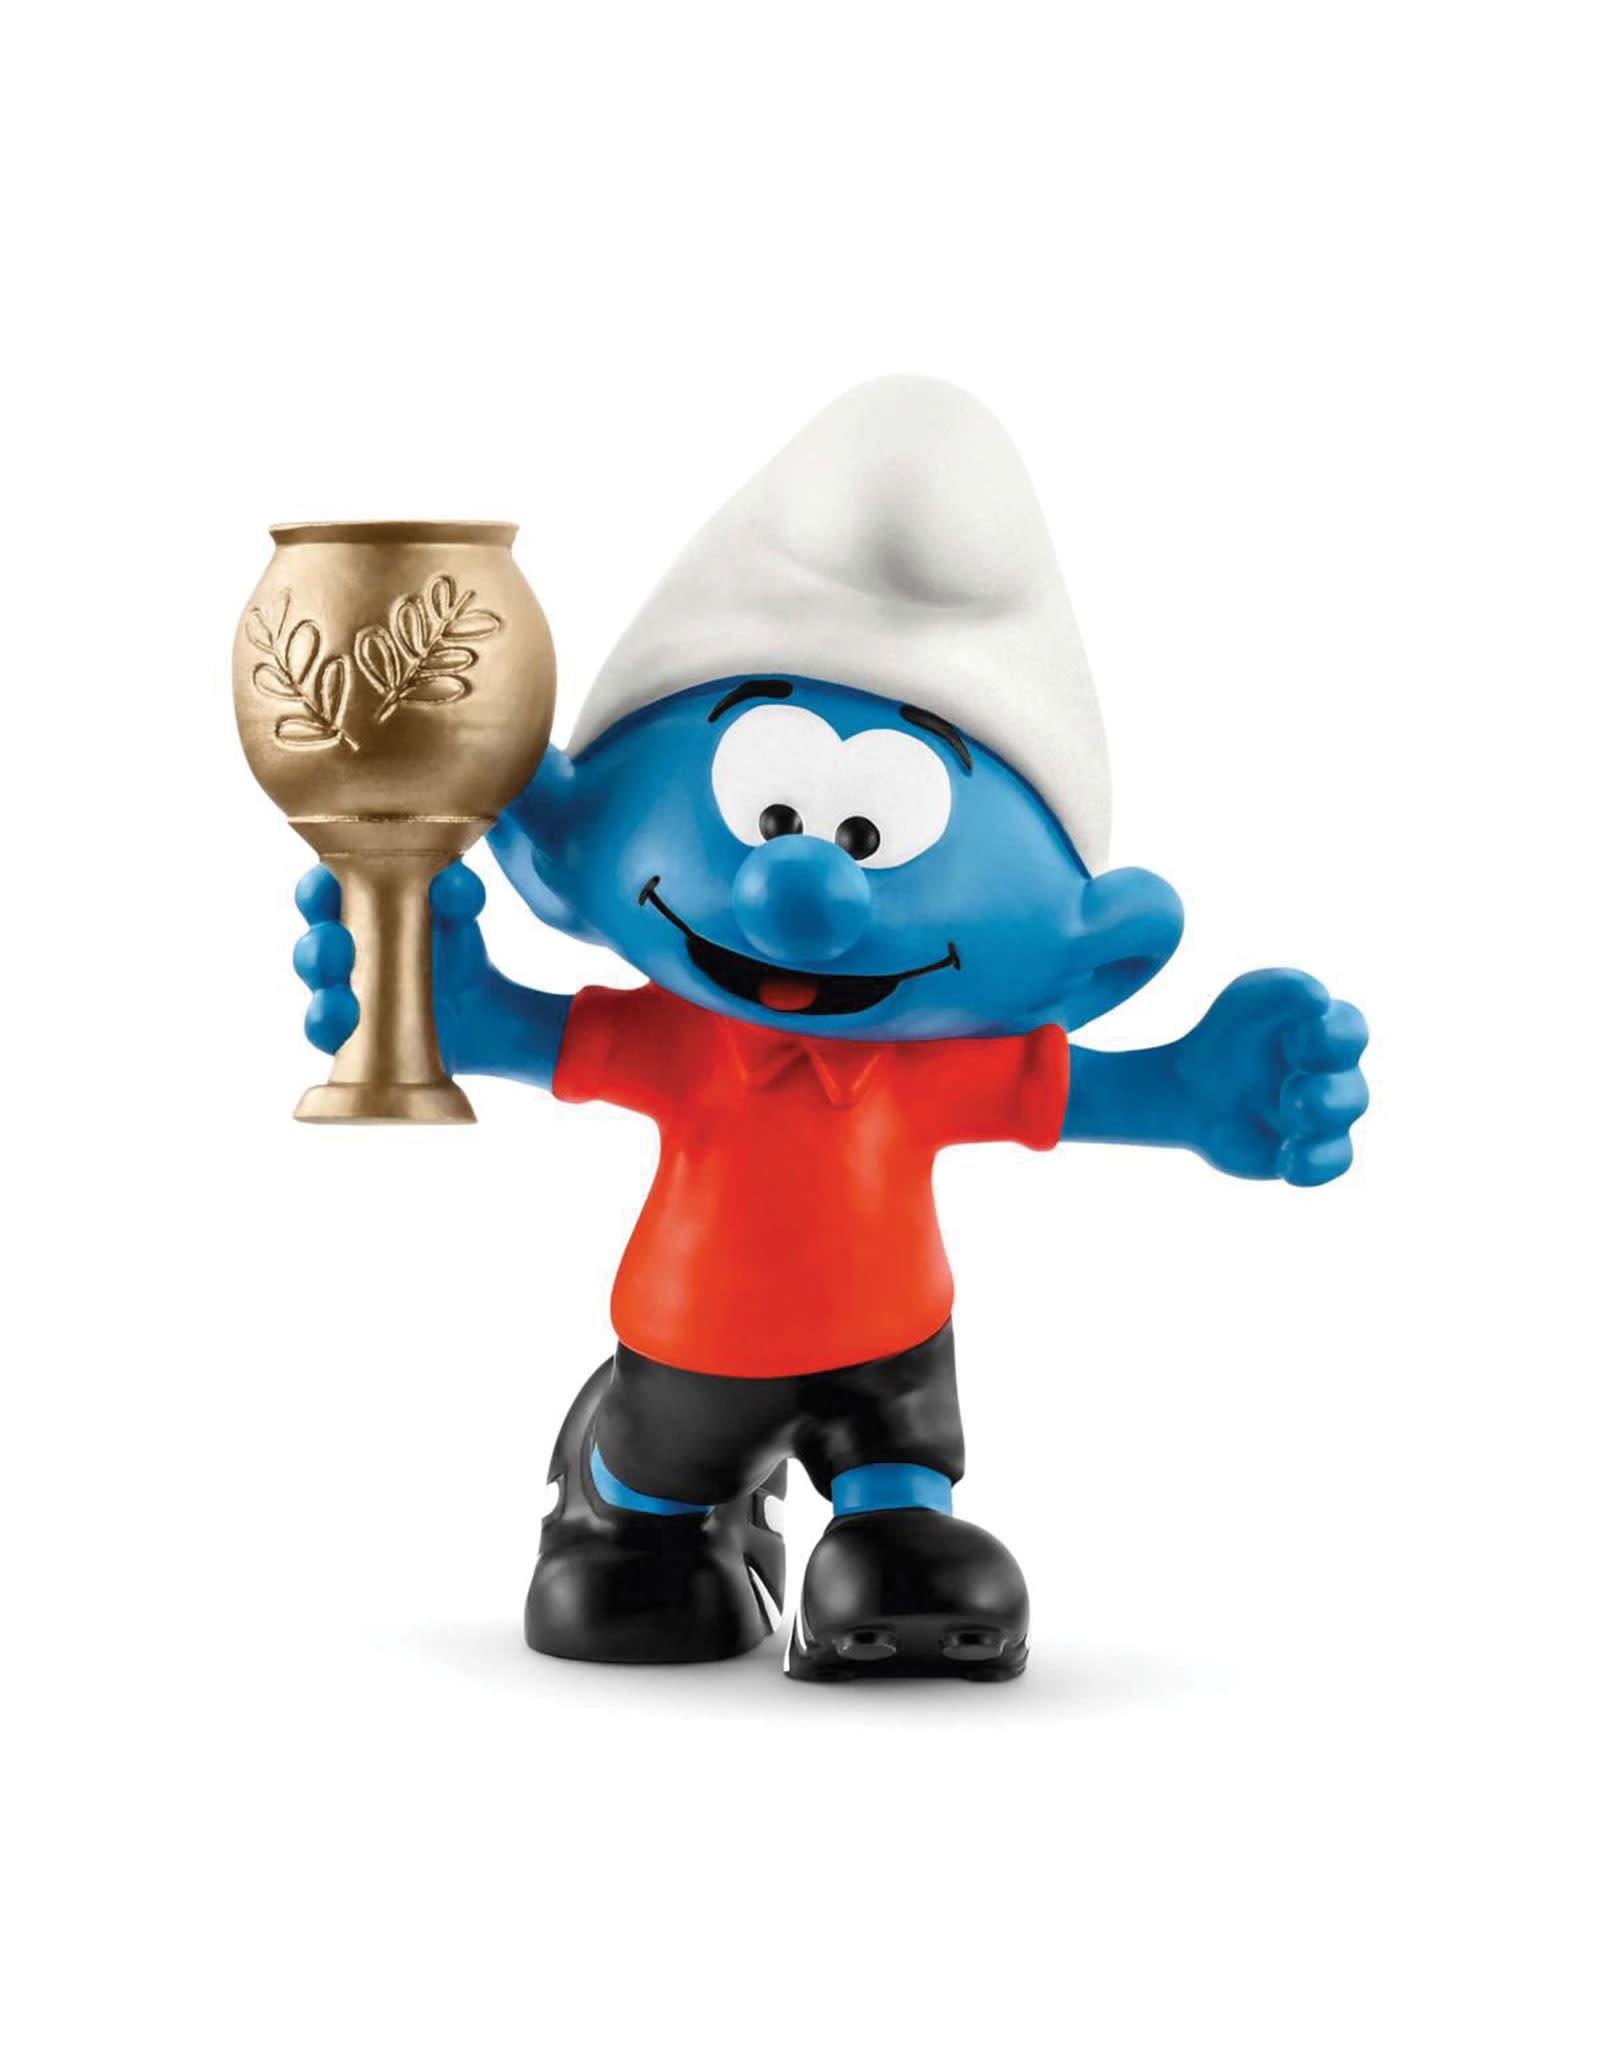 Schleich Smurf - With Football Trophy